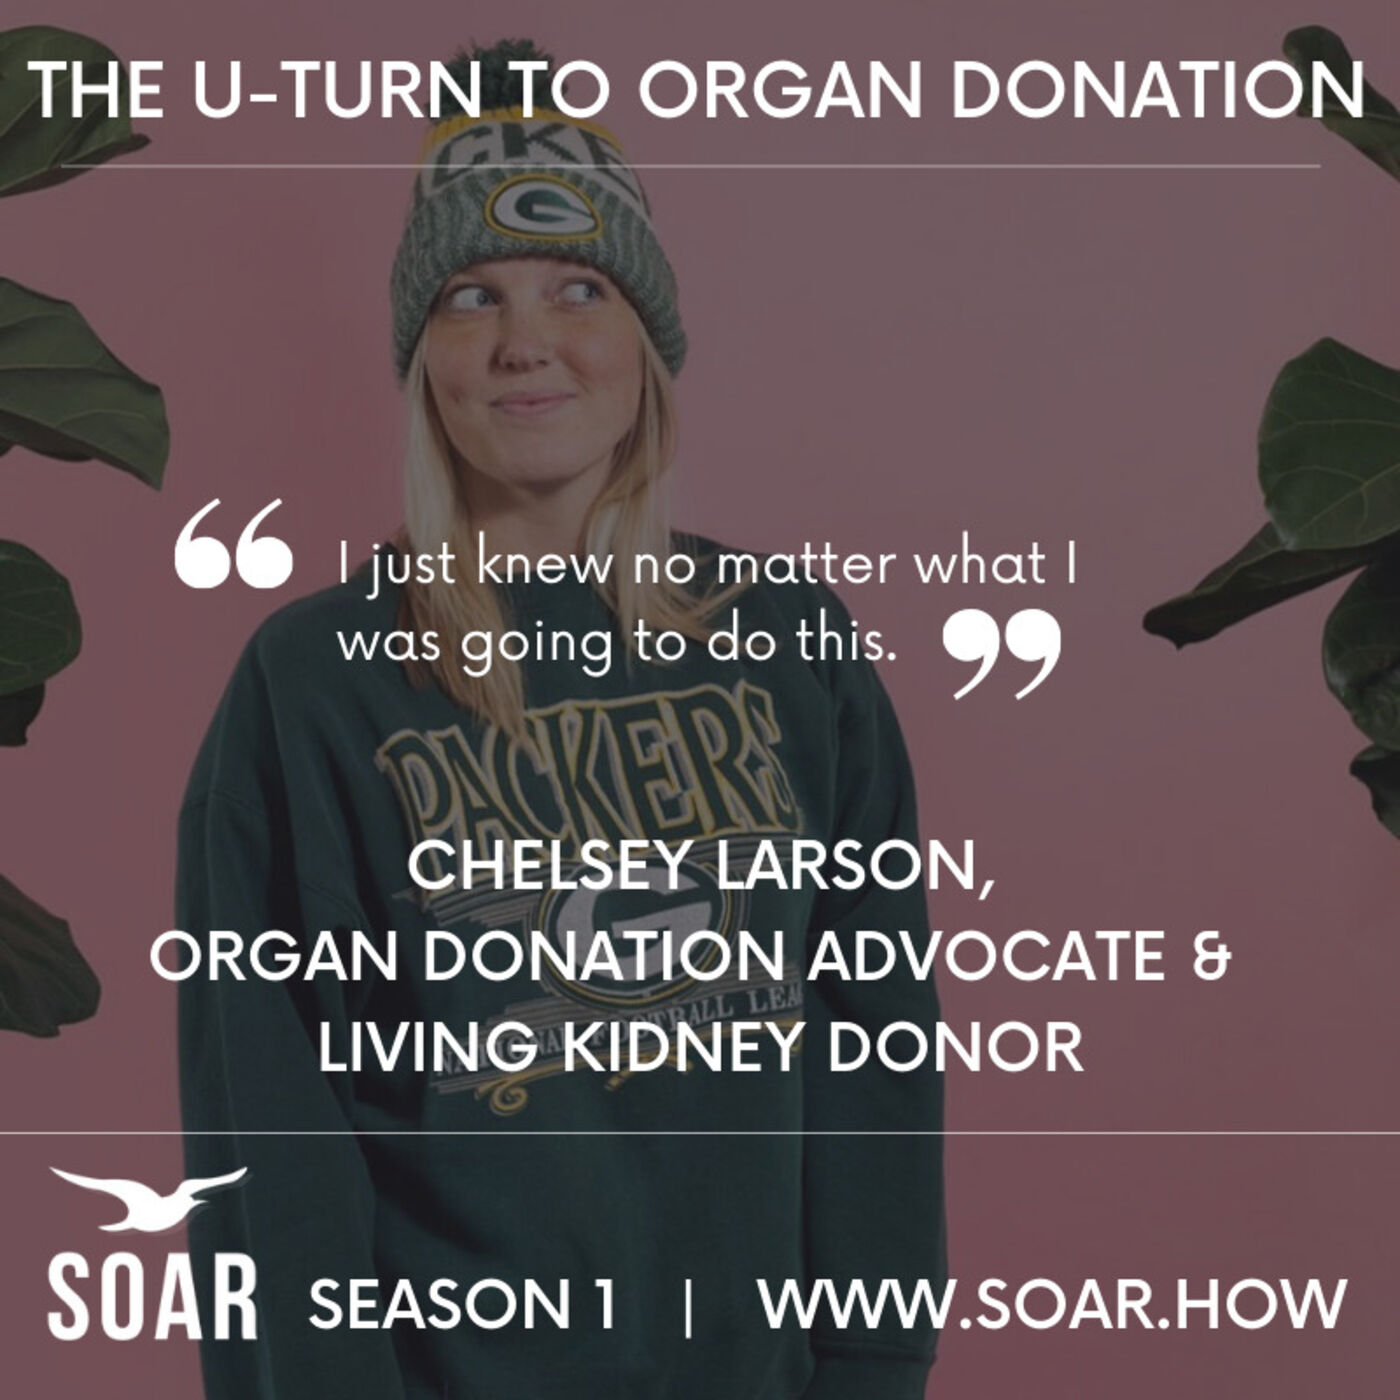 The U-Turn to Organ Donation